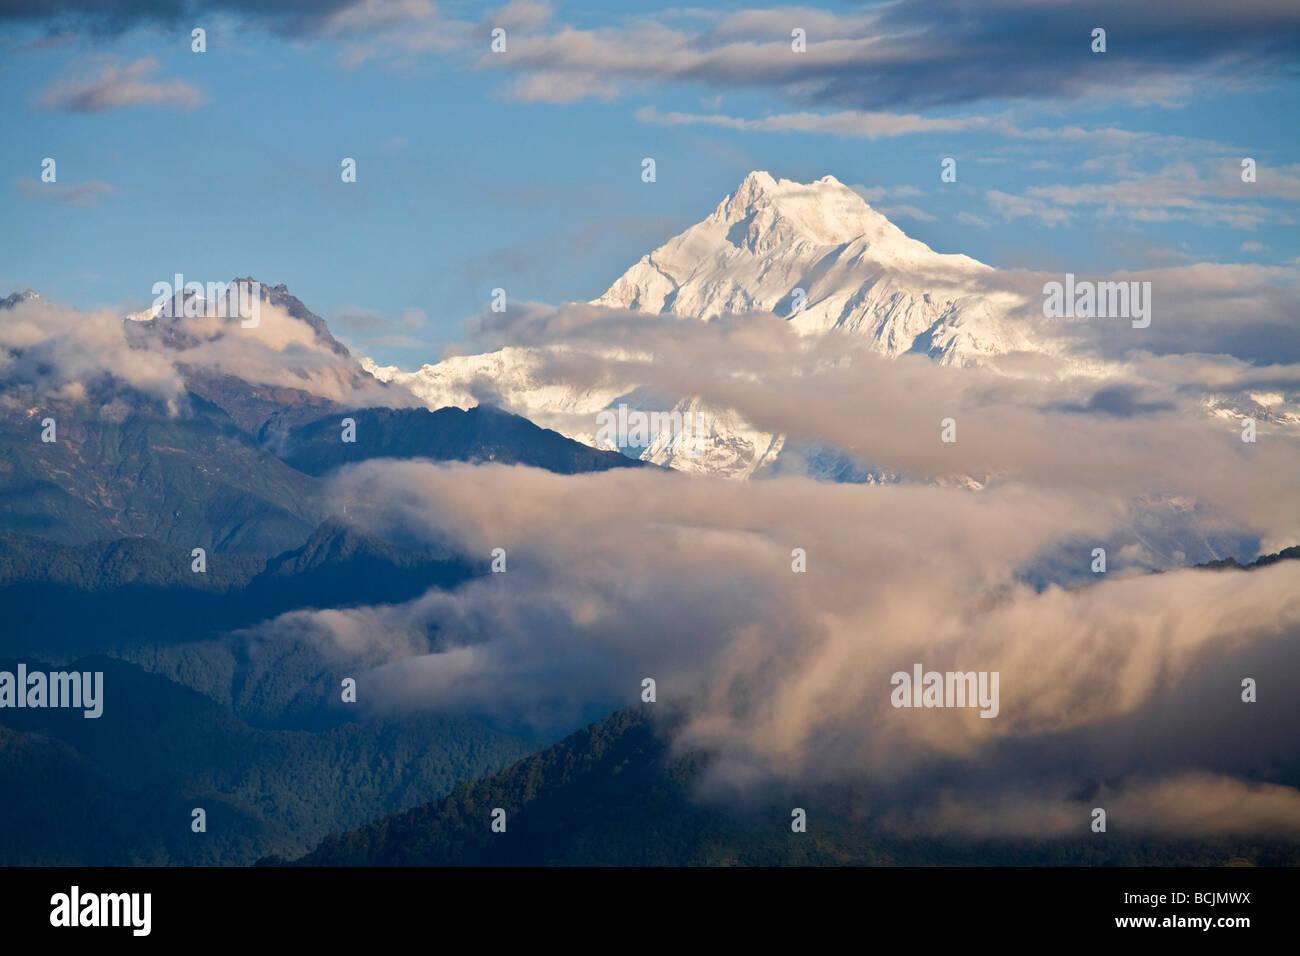 India, Sikkim, Gangtok, Tashi Viewpoint, vista di Kangchendzonga, gamma di Kangchendzonga Immagini Stock